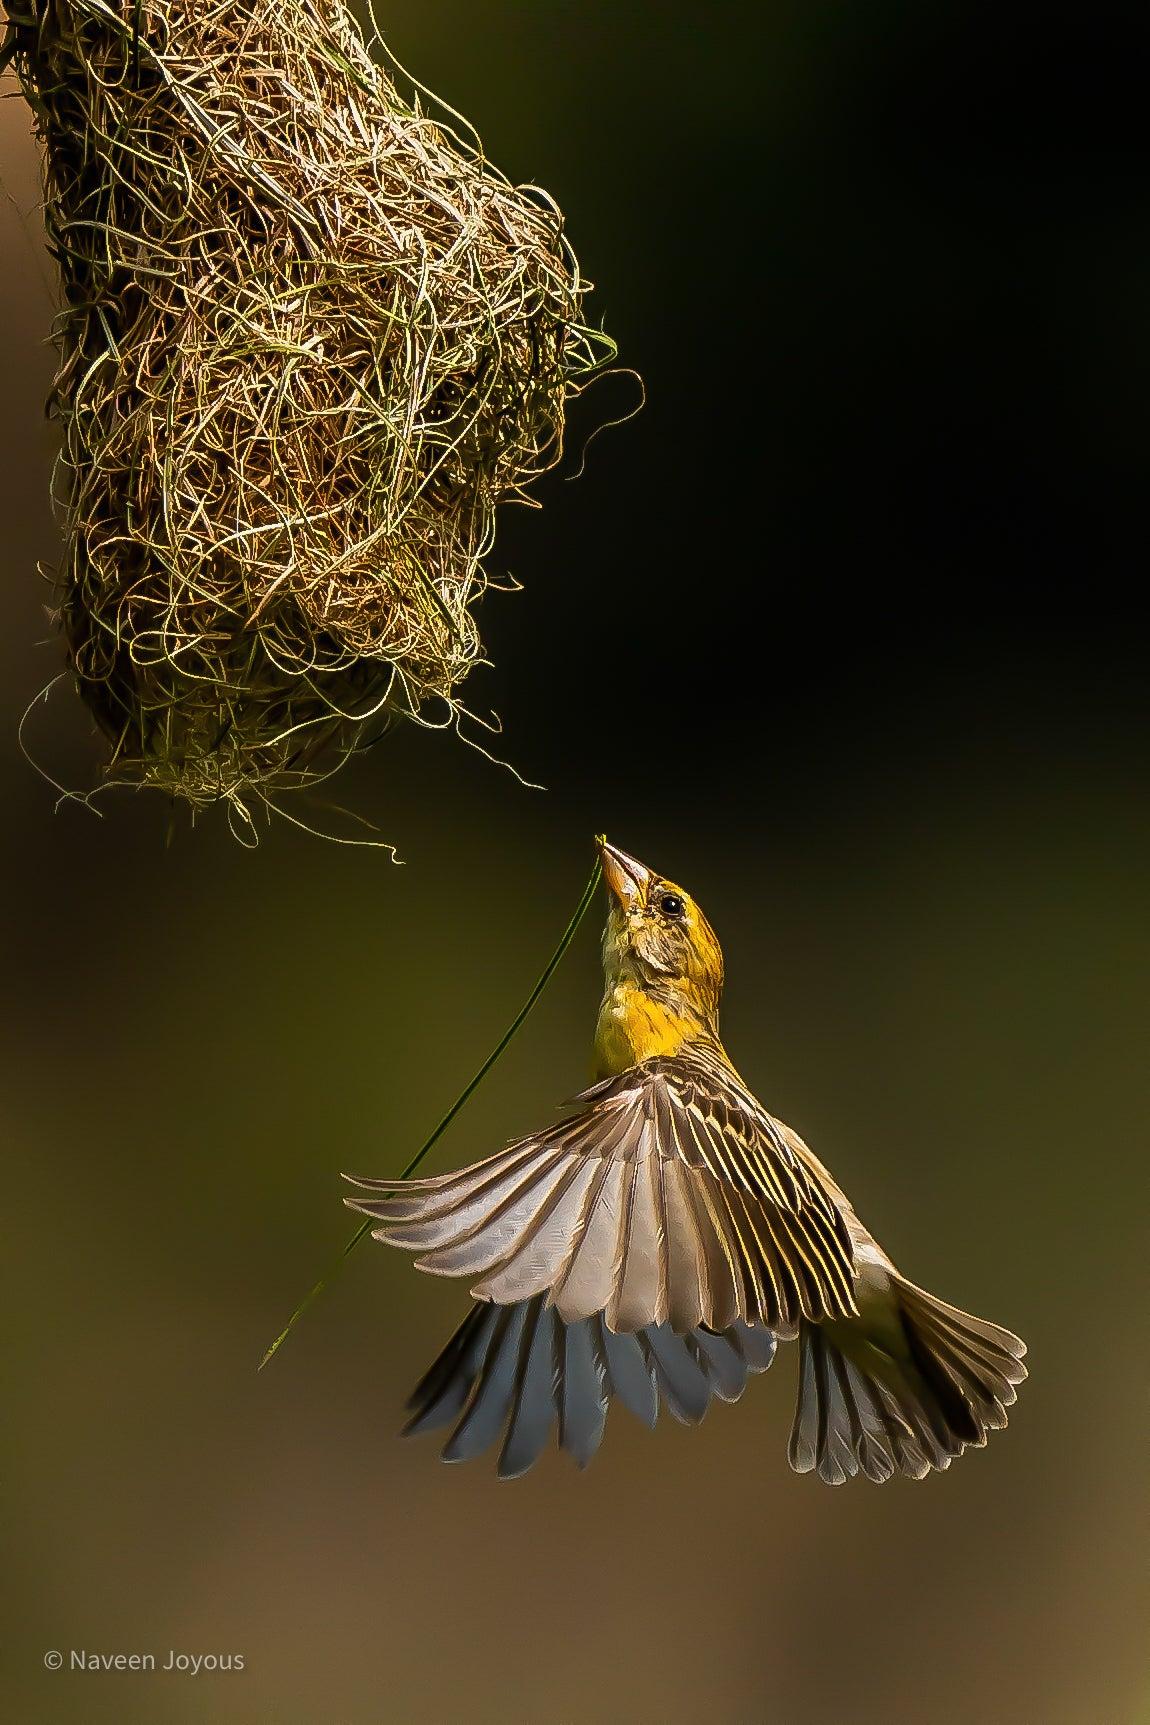 Alpha-Universe-DiscoverWithAlpha-Naveen-Joyous-Bird.JPG